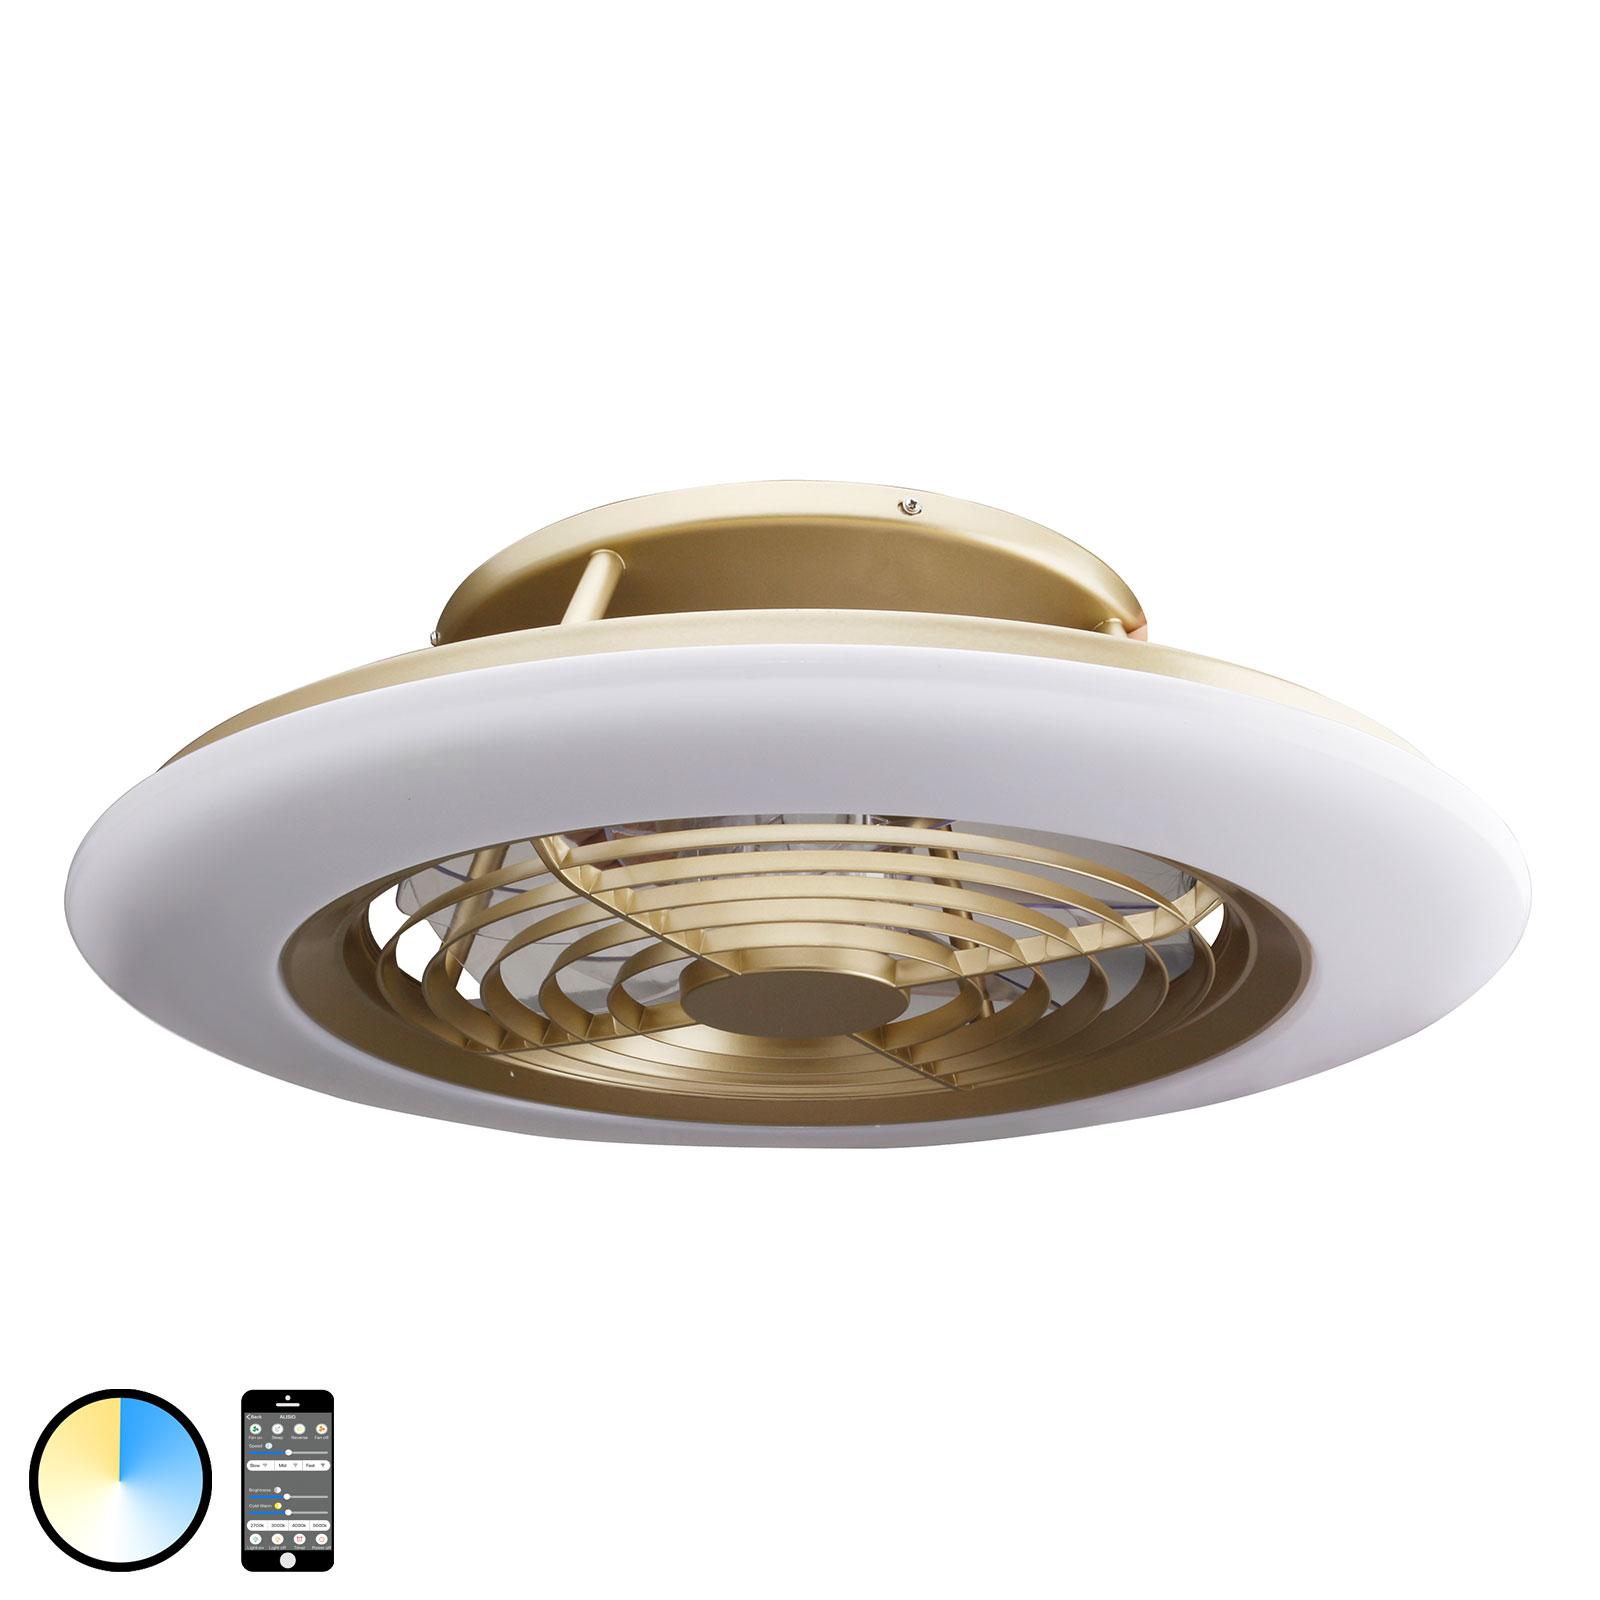 LED-takvifte Alisio, app-kontrollerbar, messing